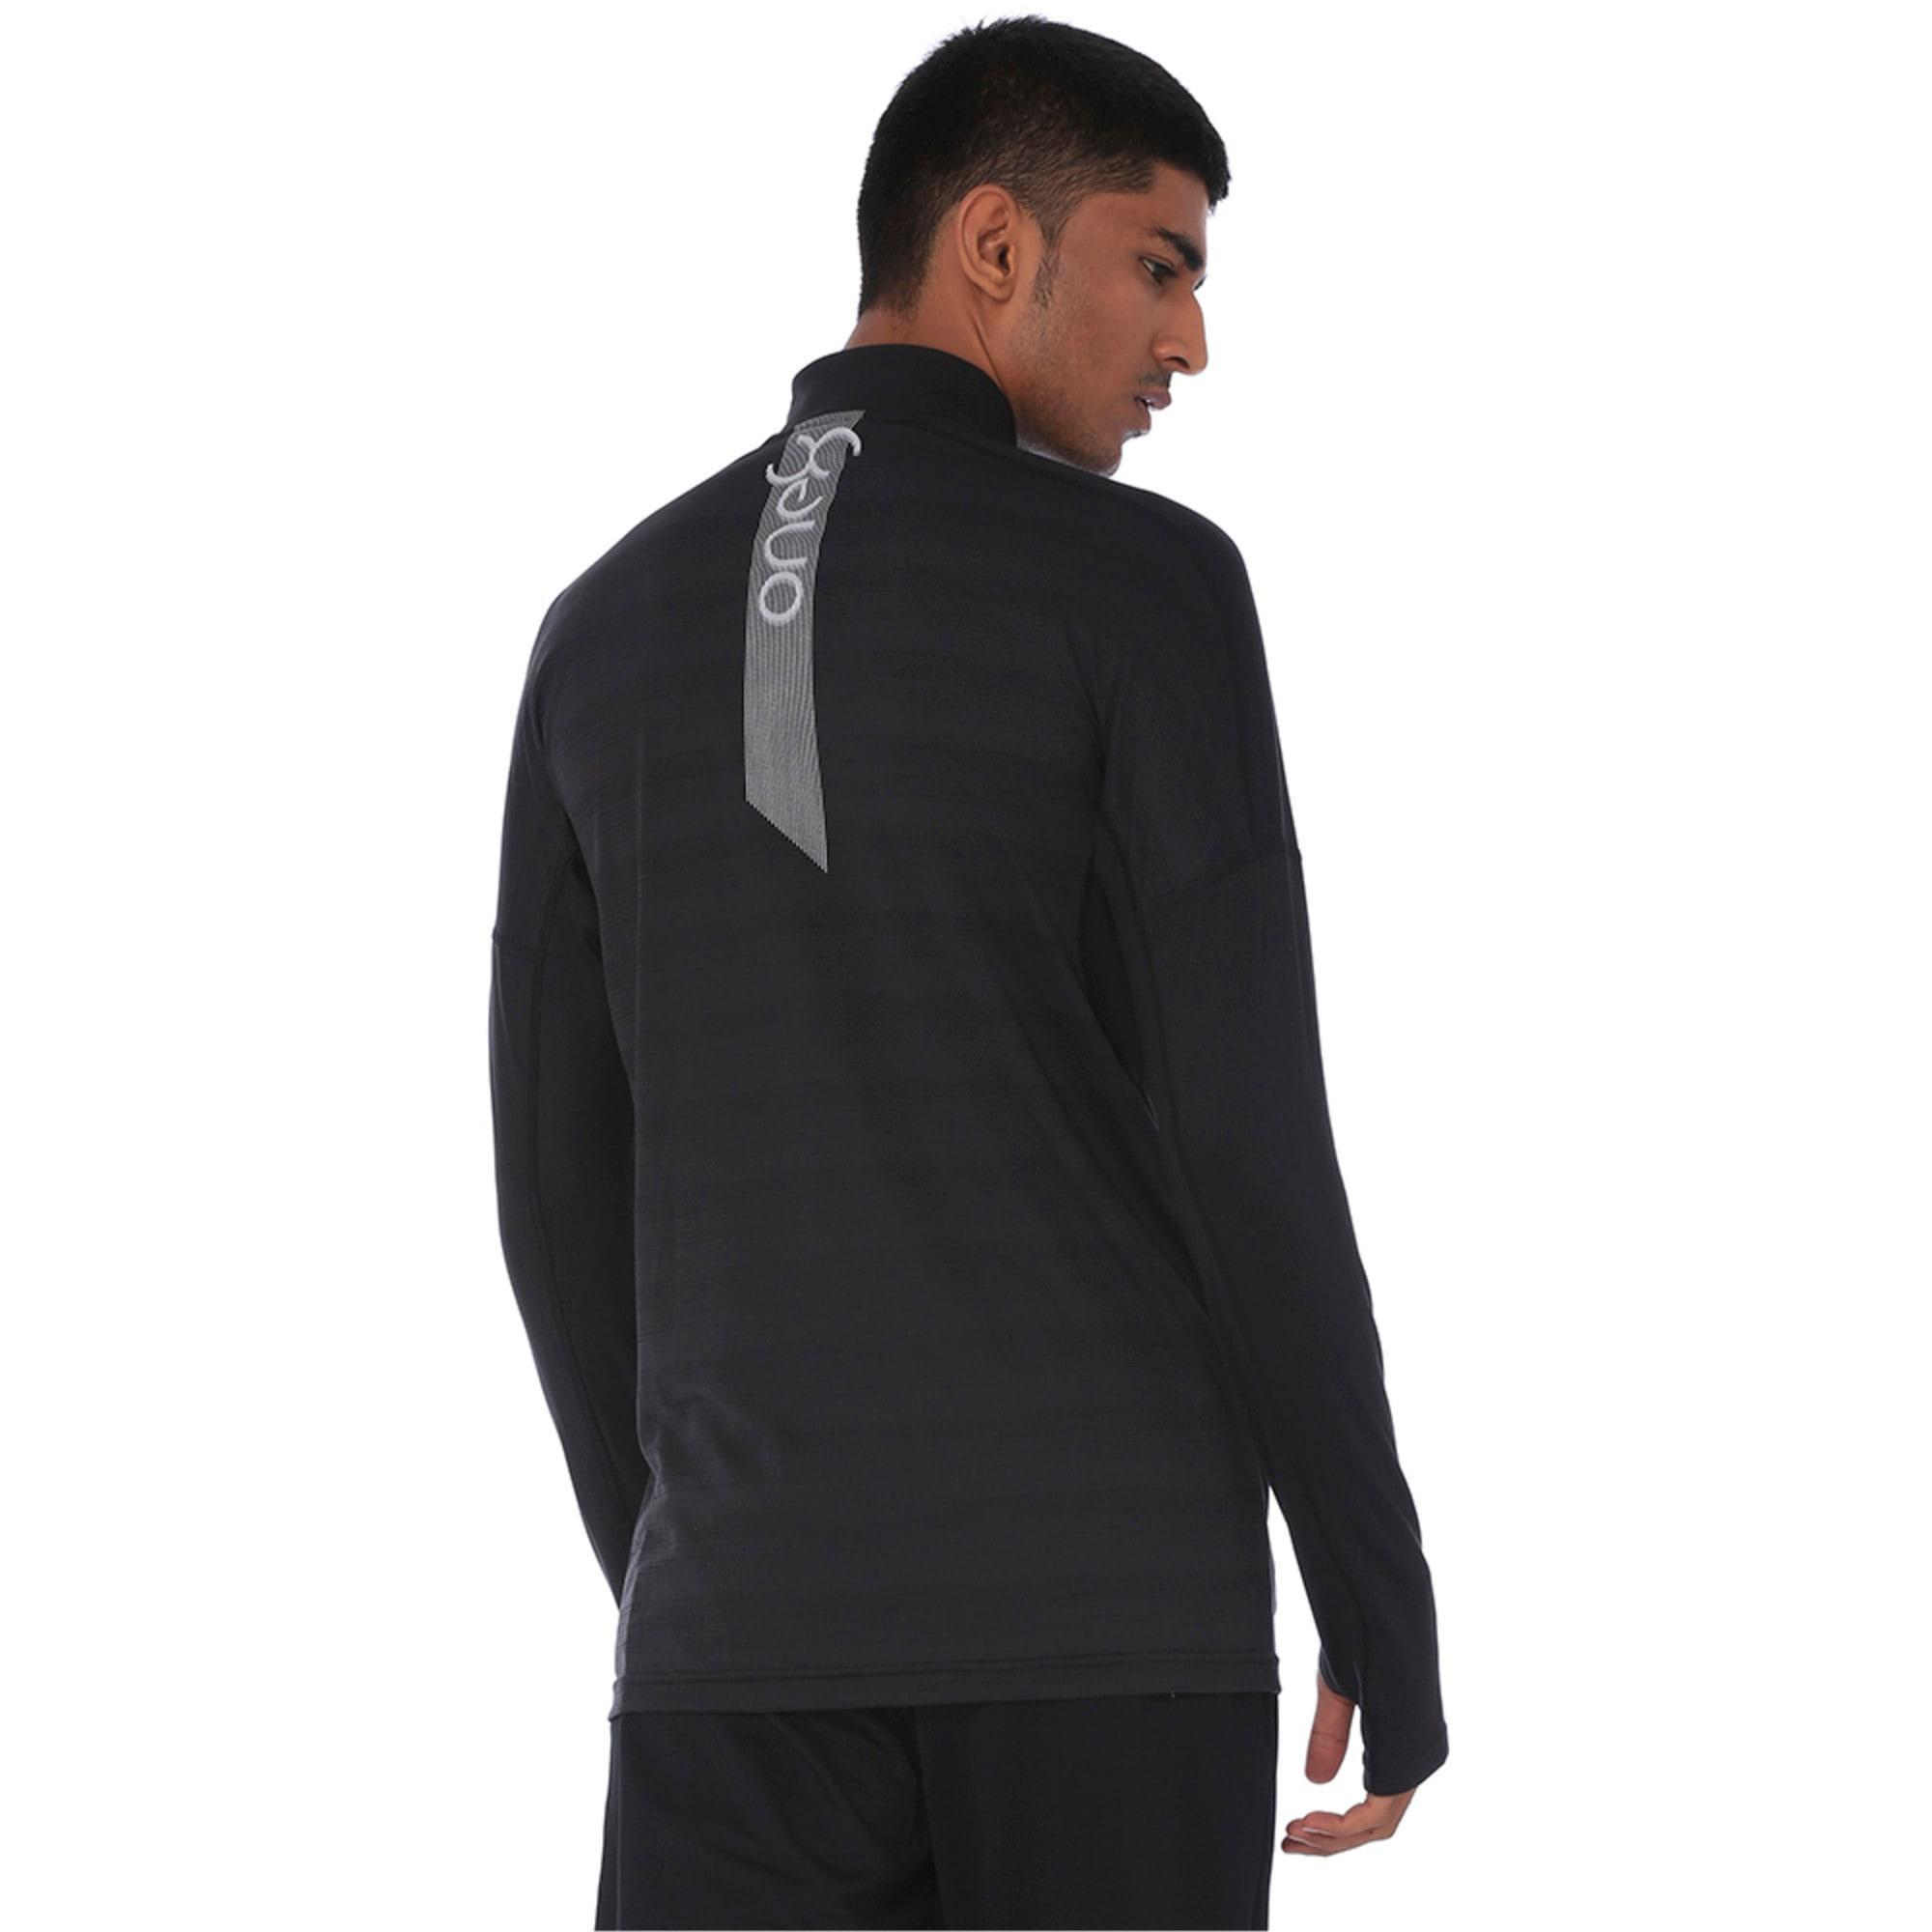 Thumbnail 5 of one8 VK Active Men's Full Zip Sweat Jacket, Puma Black, medium-IND